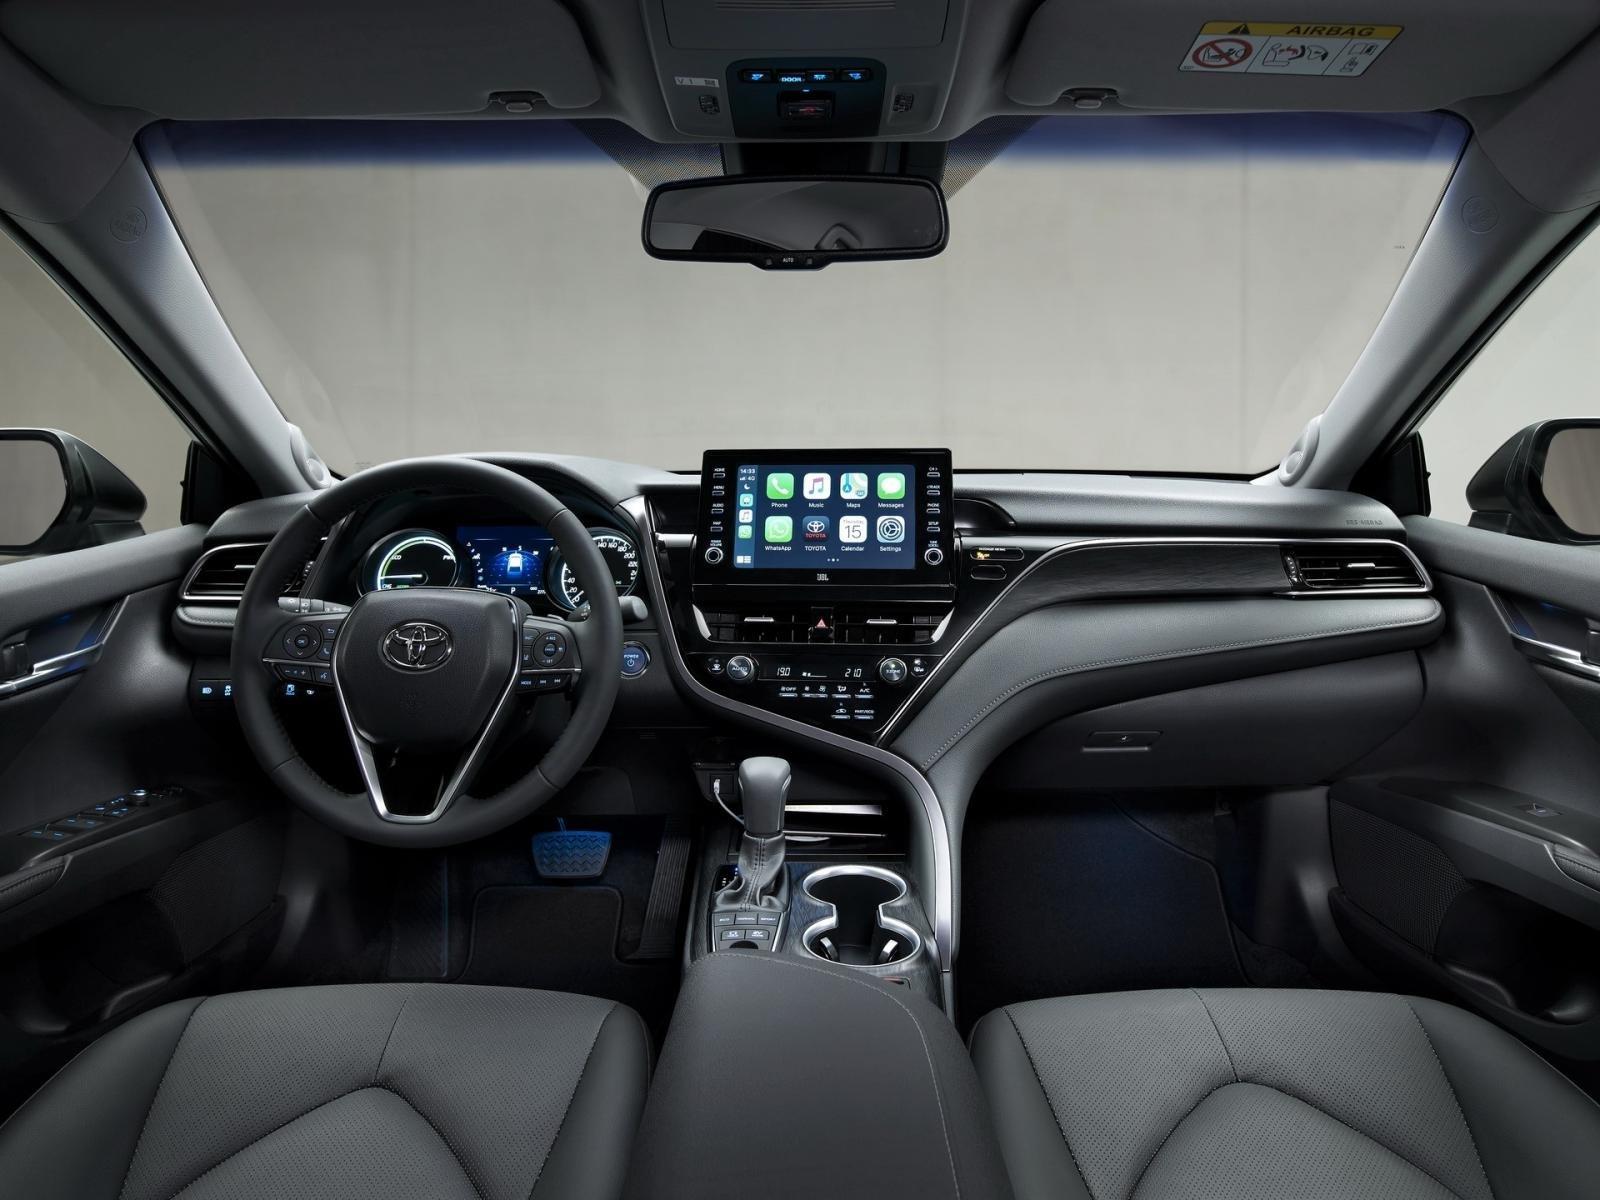 Khoang cabin xe Toyota Camry Hybrid 2021 1